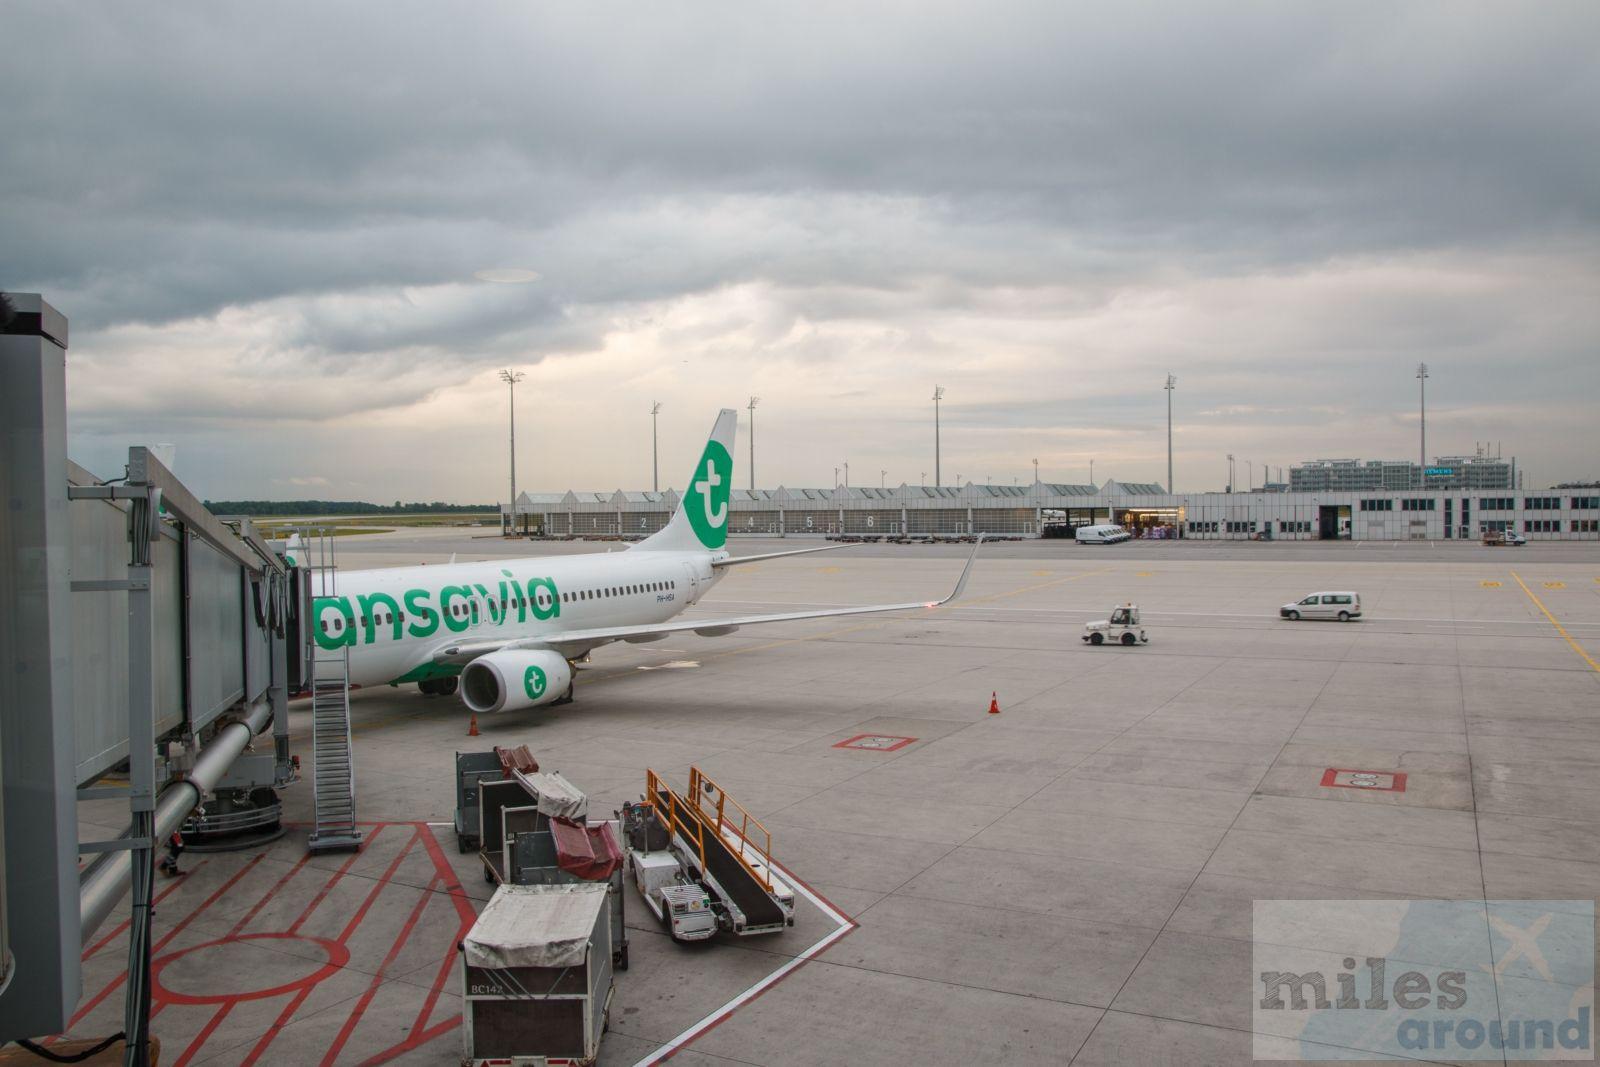 Transavia Boeing 737-800 - Check more at https://www.miles-around.de/trip-reports/economy-class/mit-transavia-von-muenchen-nach-berlin-schoenefeld/,  #BerlinSchönefeld #Boeing737 #FlughafenMünchen #LowCost #MUC #SXF #Transavia